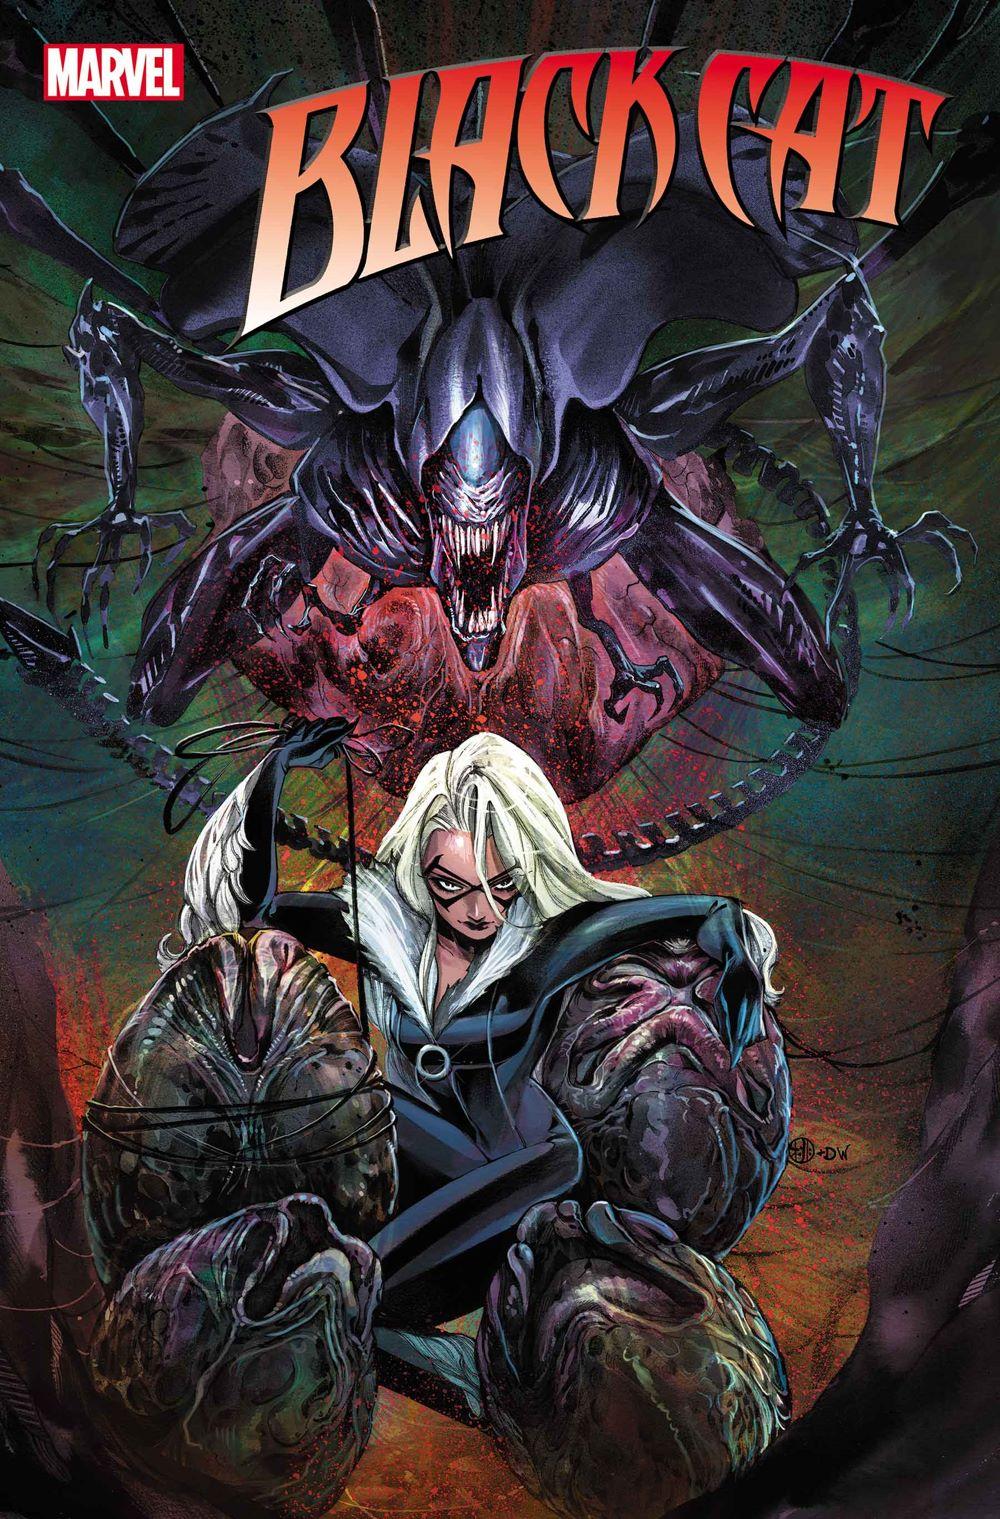 BLACKCAT2020002_MomokoVar Marvel Comics January 2021 Solicitations